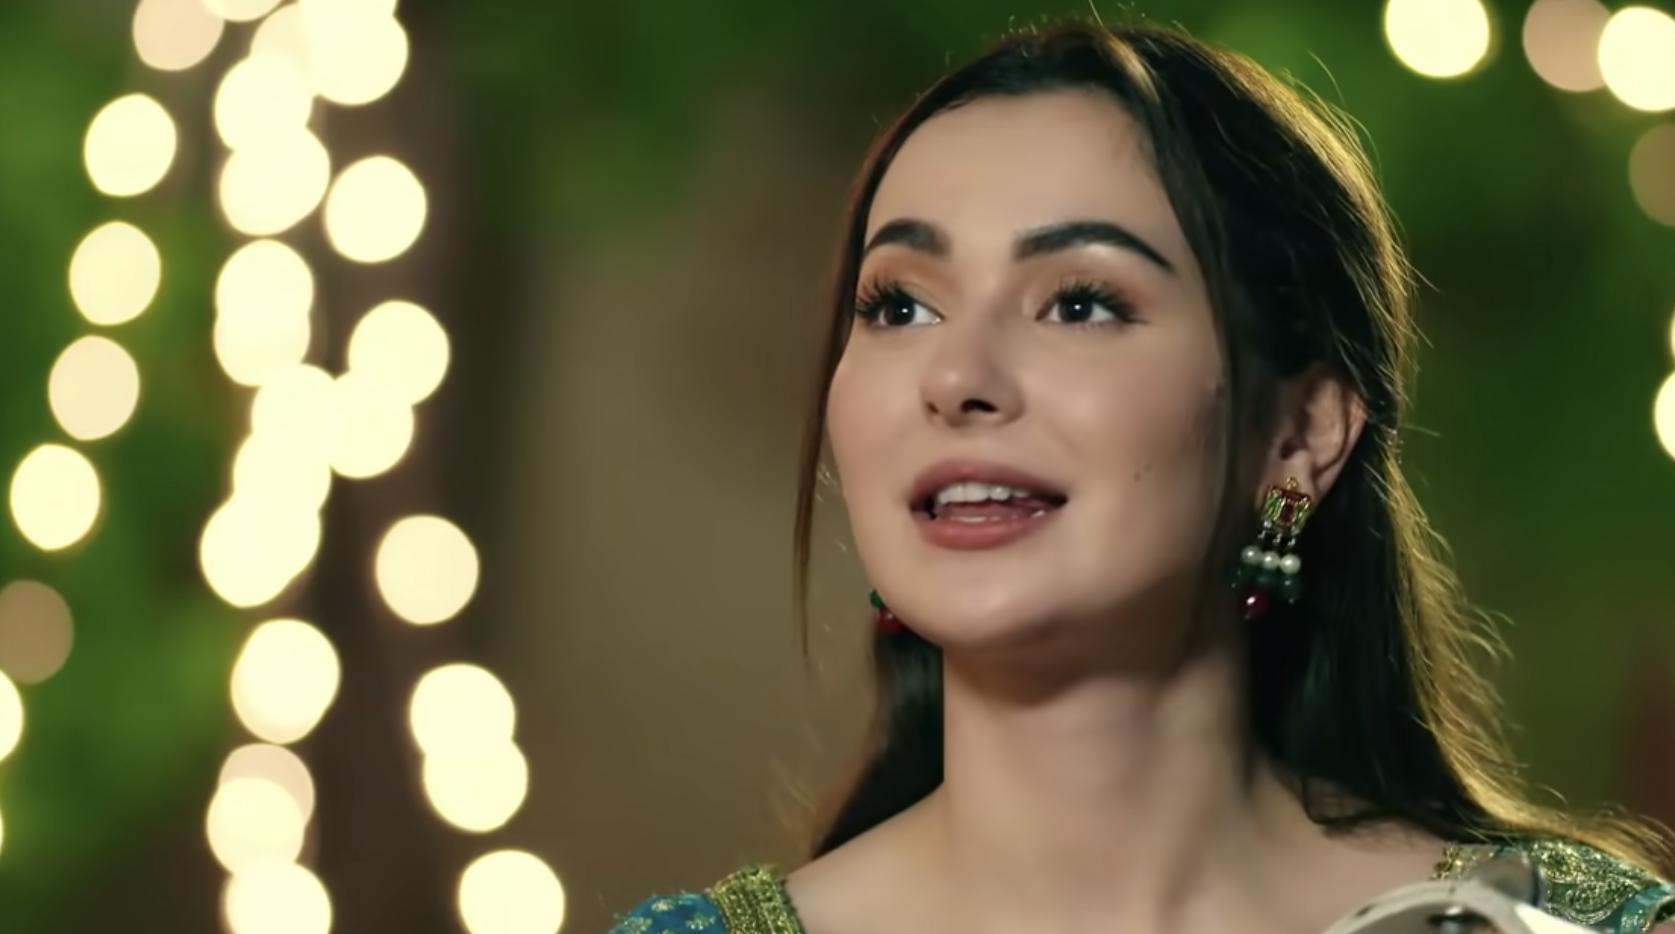 Dil Ruba Episode 10:  Is Hania Amir's Show Progressive or Misogynistic?